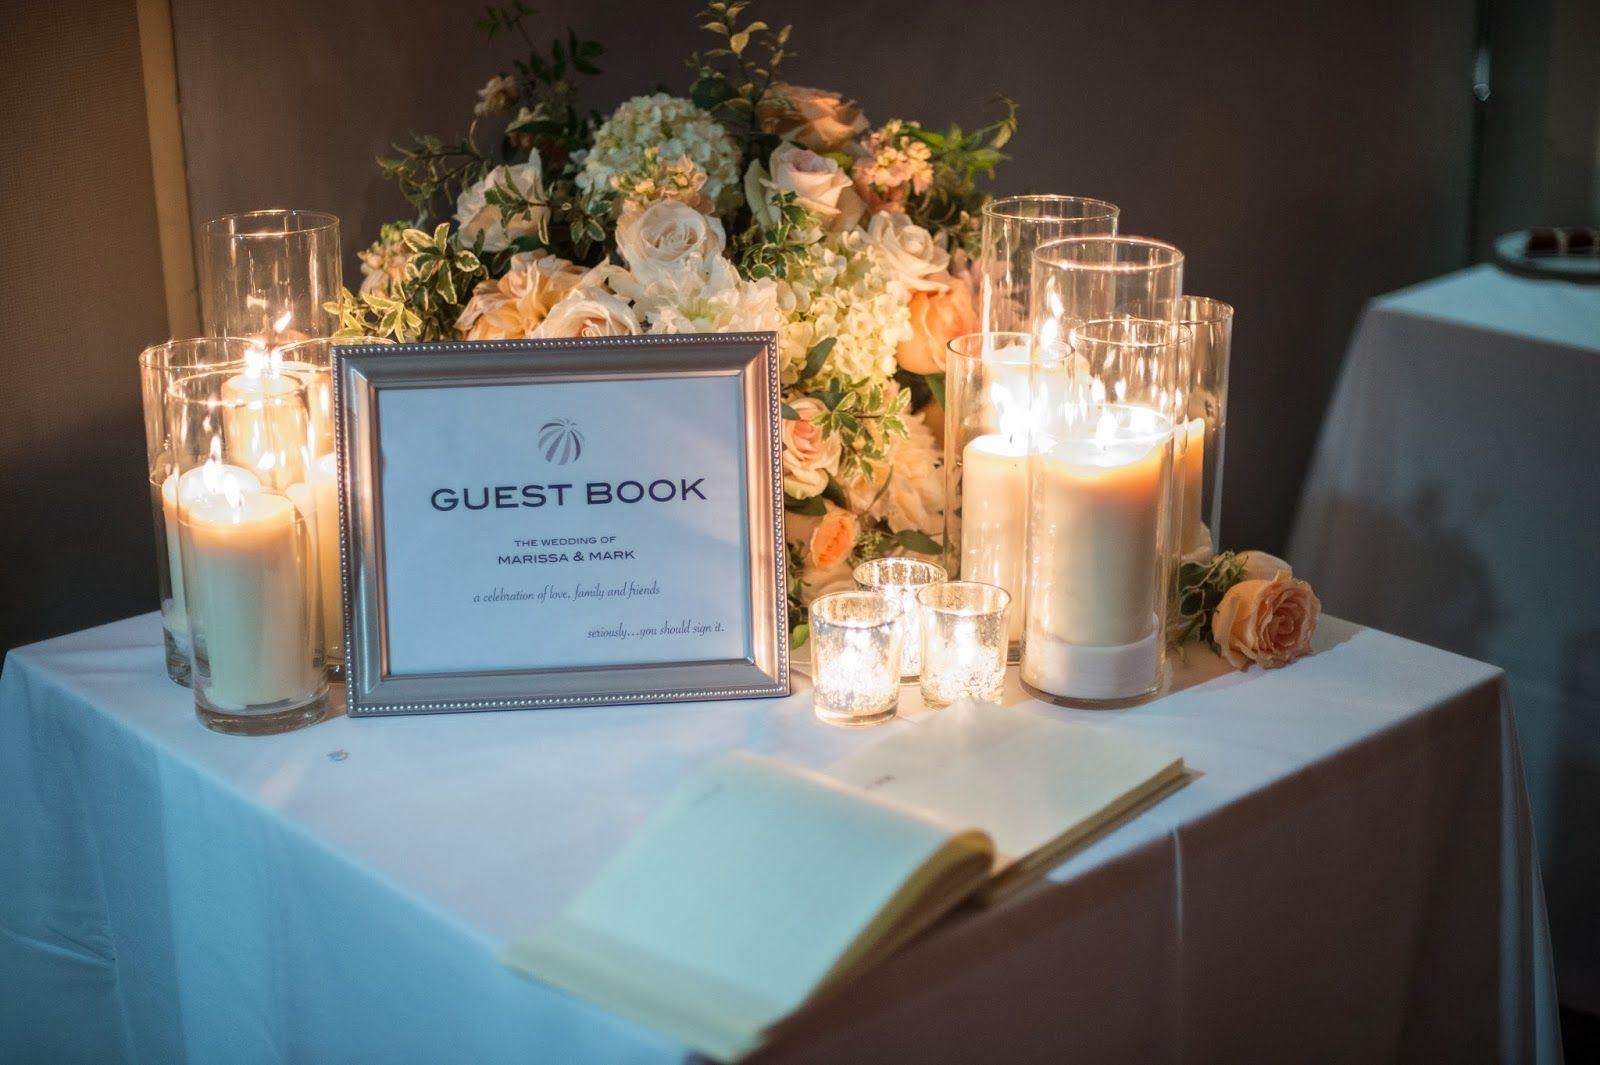 romantic-beach-wedding - guestbook table | beach wedding | Pinterest ...